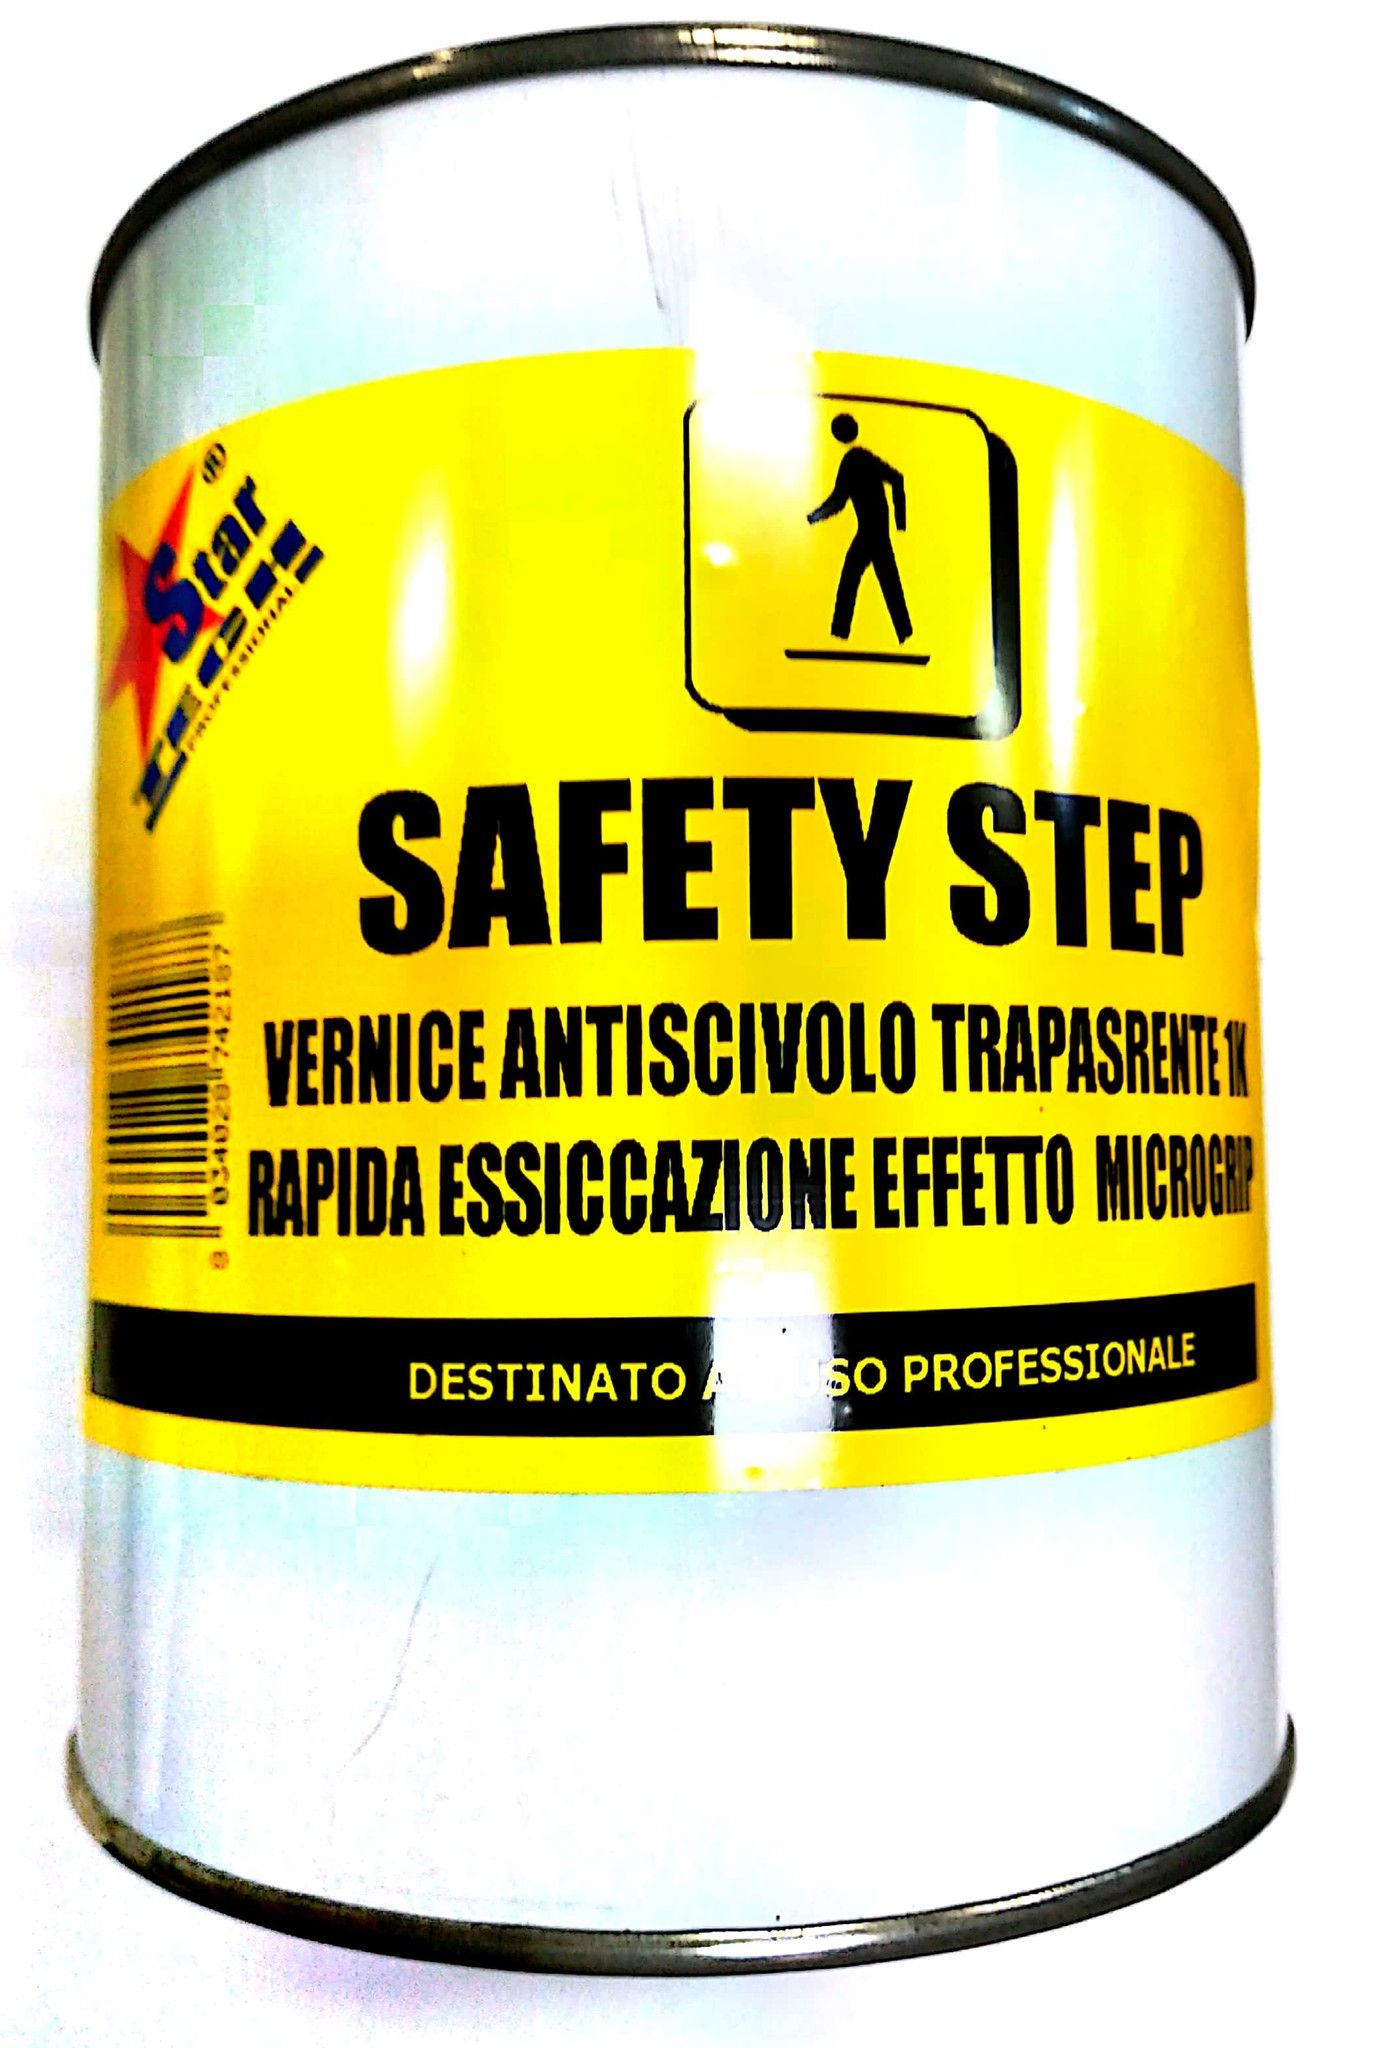 Vernice antiscivolo antisdrucciolo trasparente 750 ml SAFETY STEP STAR TECH